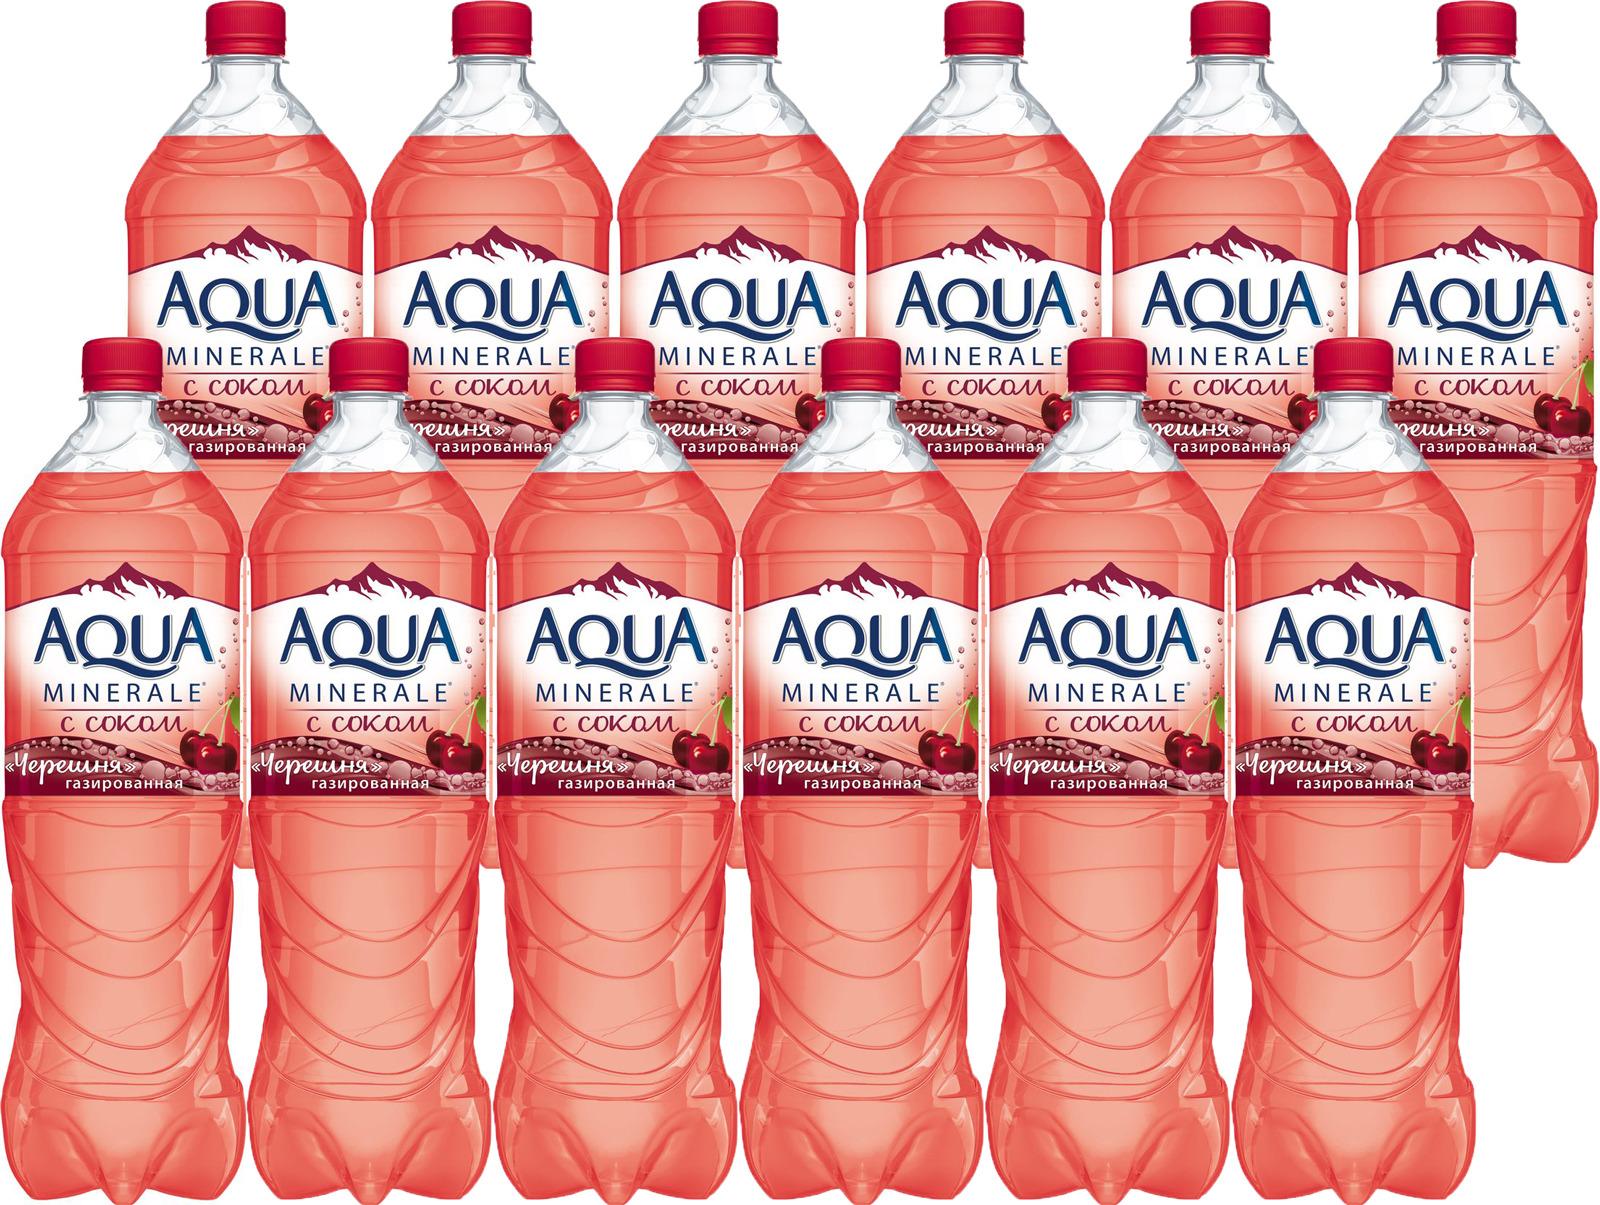 Вода Aqua Minerale Черешня, с соком, 1,5 л по 6 шт wicked aqua candy apple 60 мл с ароматом сахарного яблока